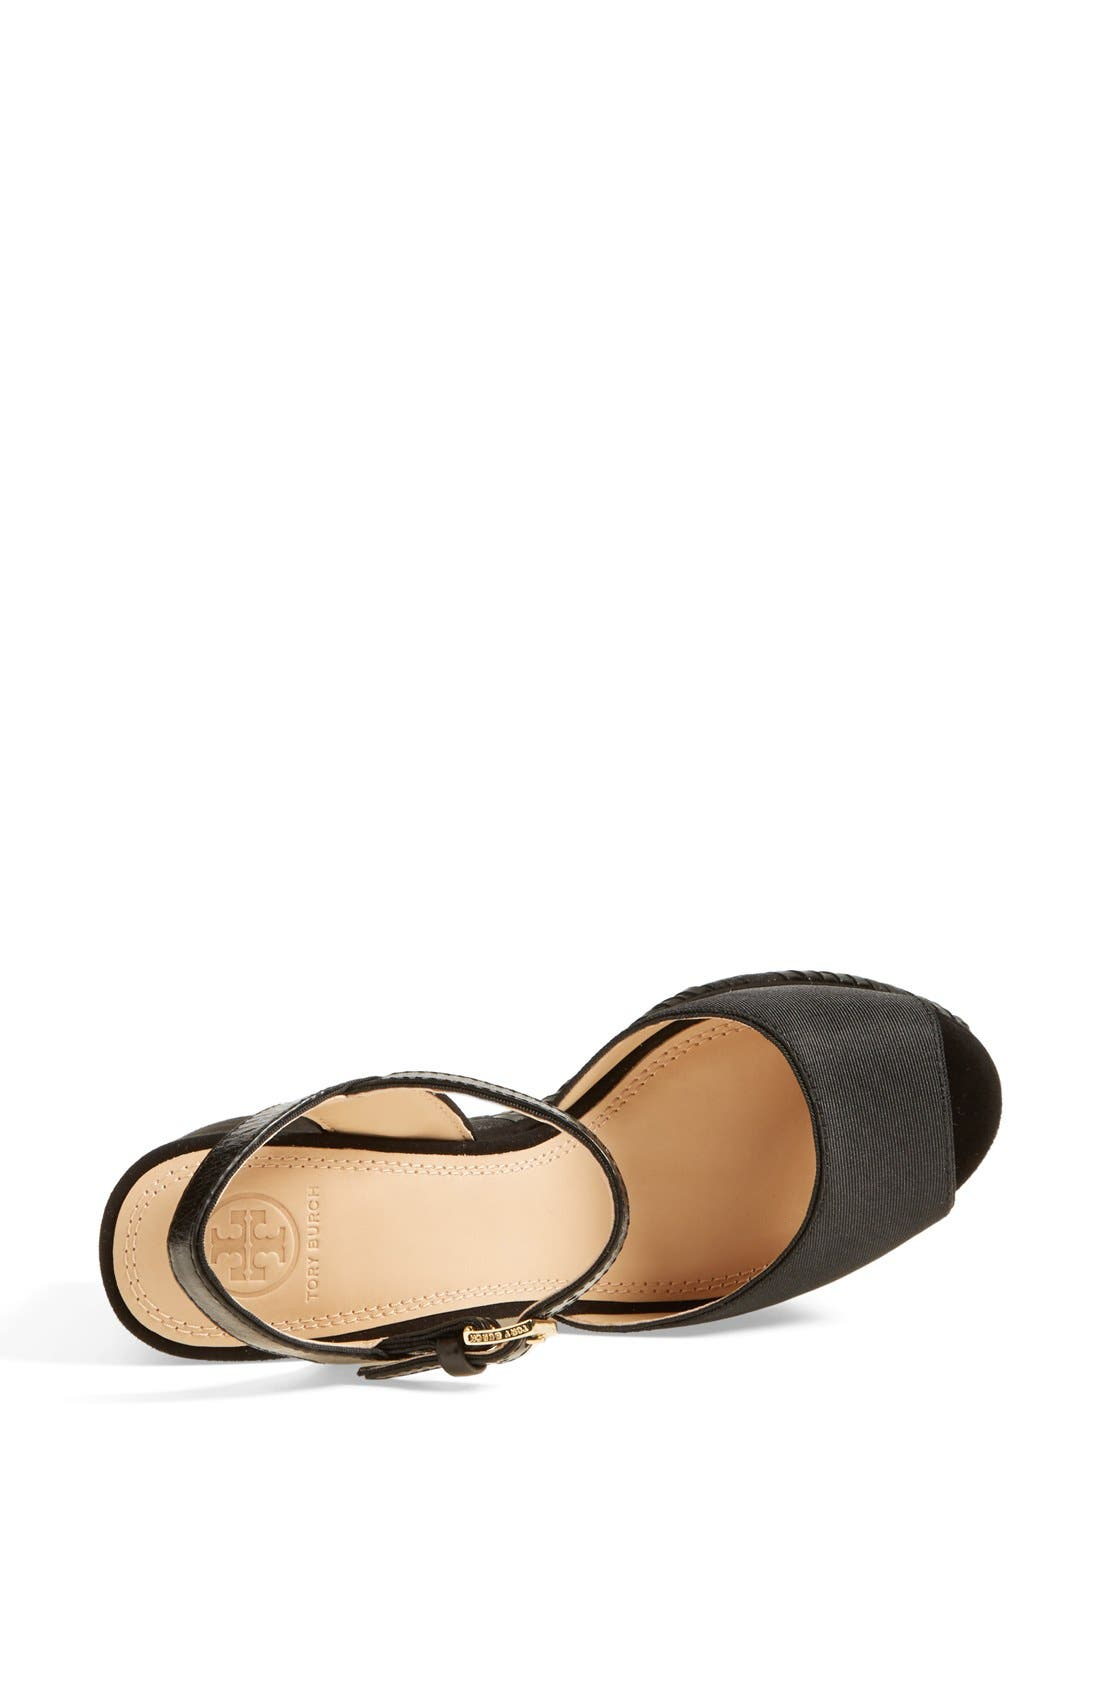 Alternate Image 3  - Tory Burch 'Brie' Platform Sandal